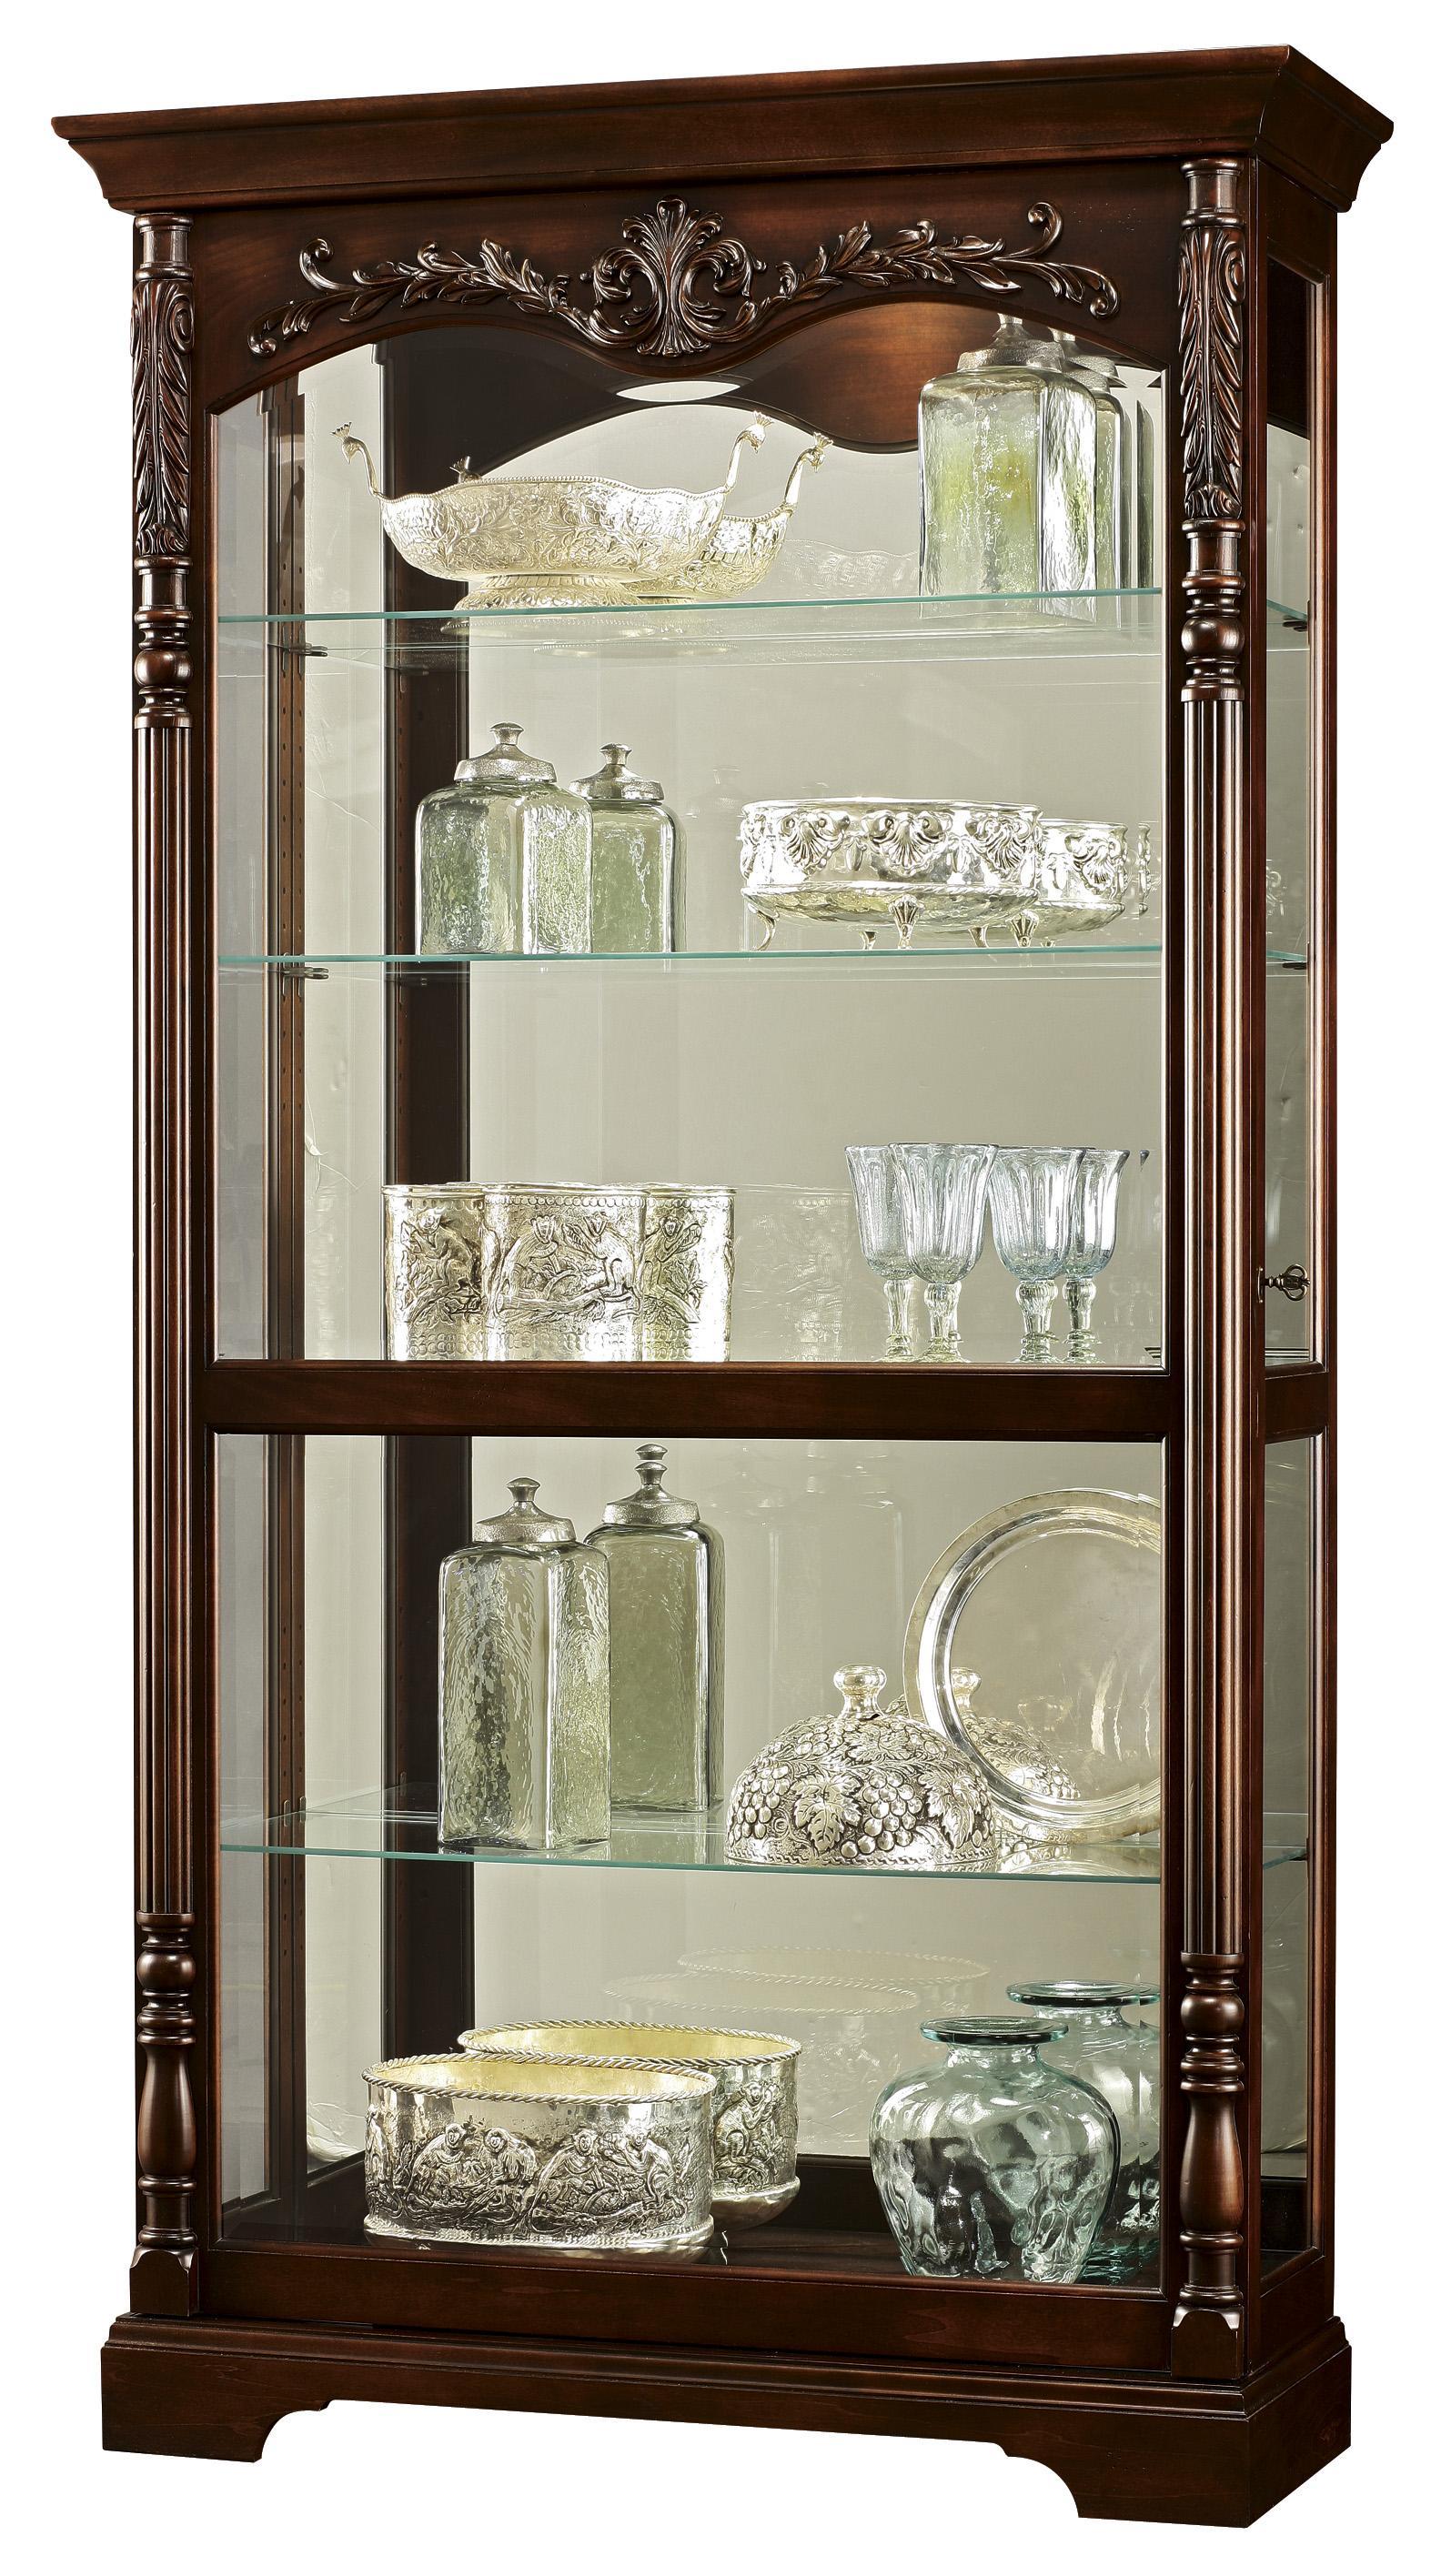 Furniture Trend Designs Curios Felicia Display Cabinet